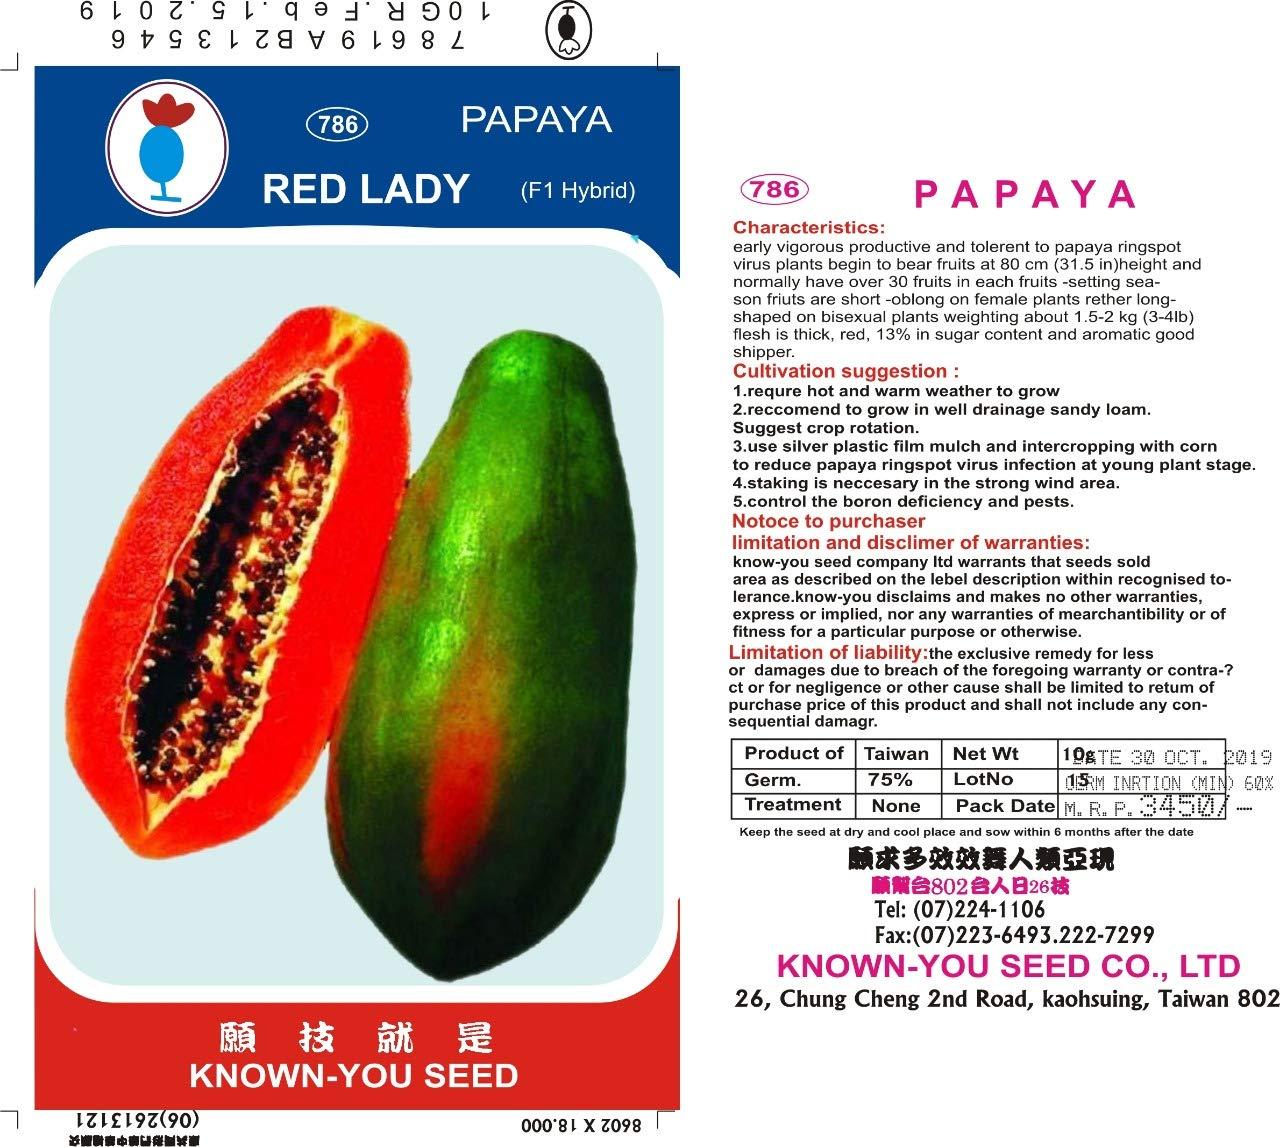 know u seeds Red Lady F1 Hybrid 786 Papaya Taiwan Seeds - Pack 10 g